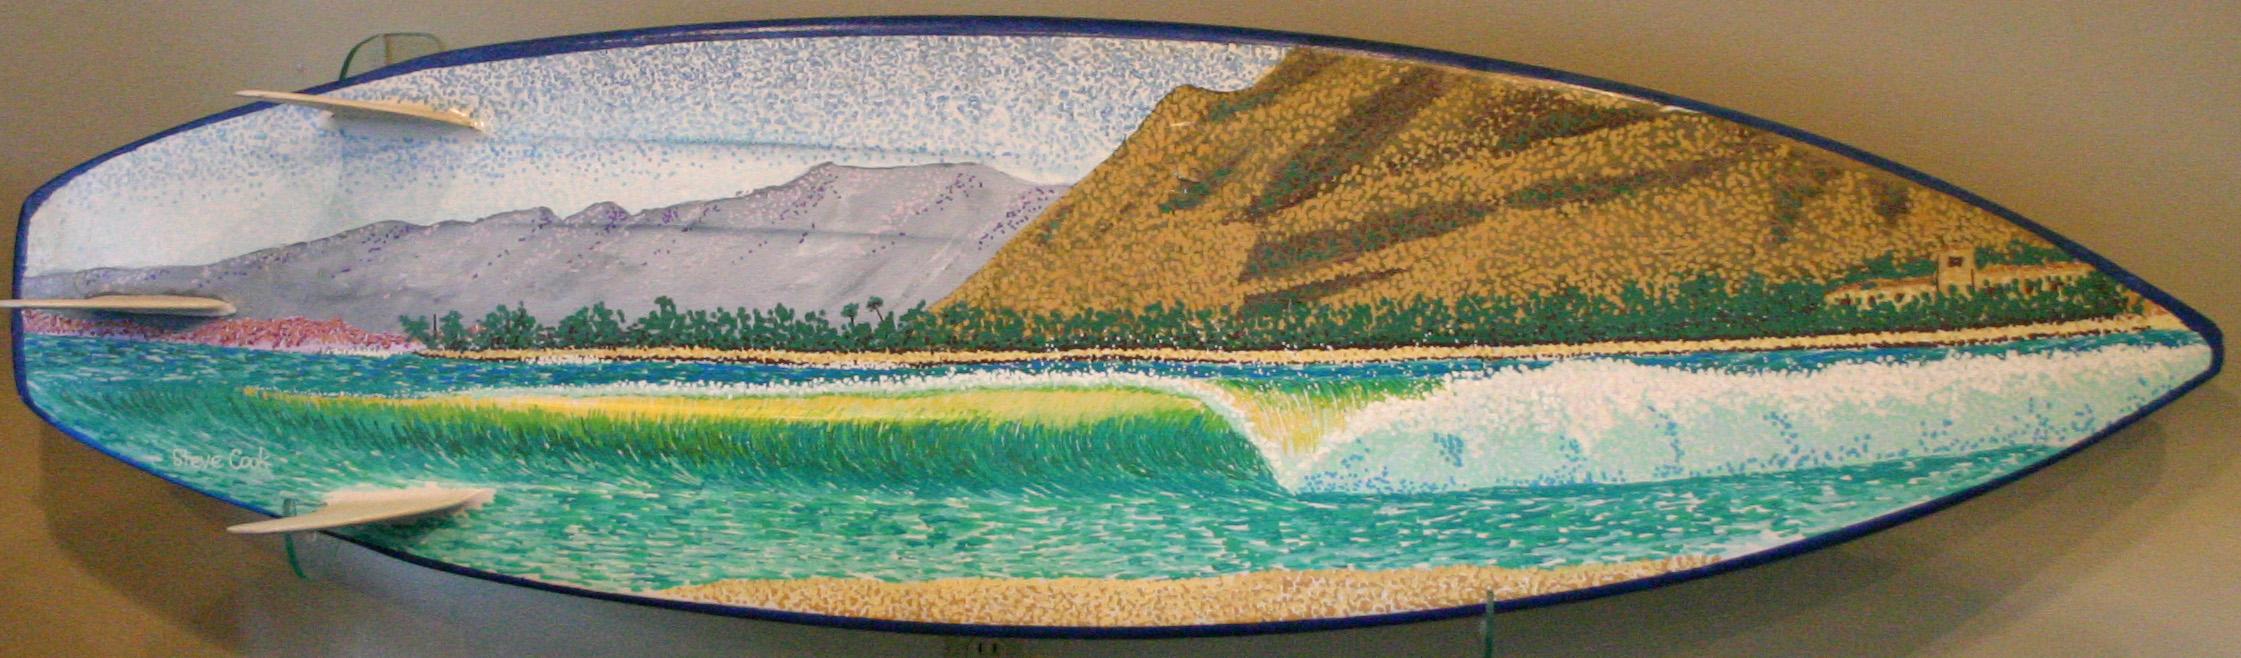 """Brunswick Lane Perfection"" paint pens on surfboard  sold"